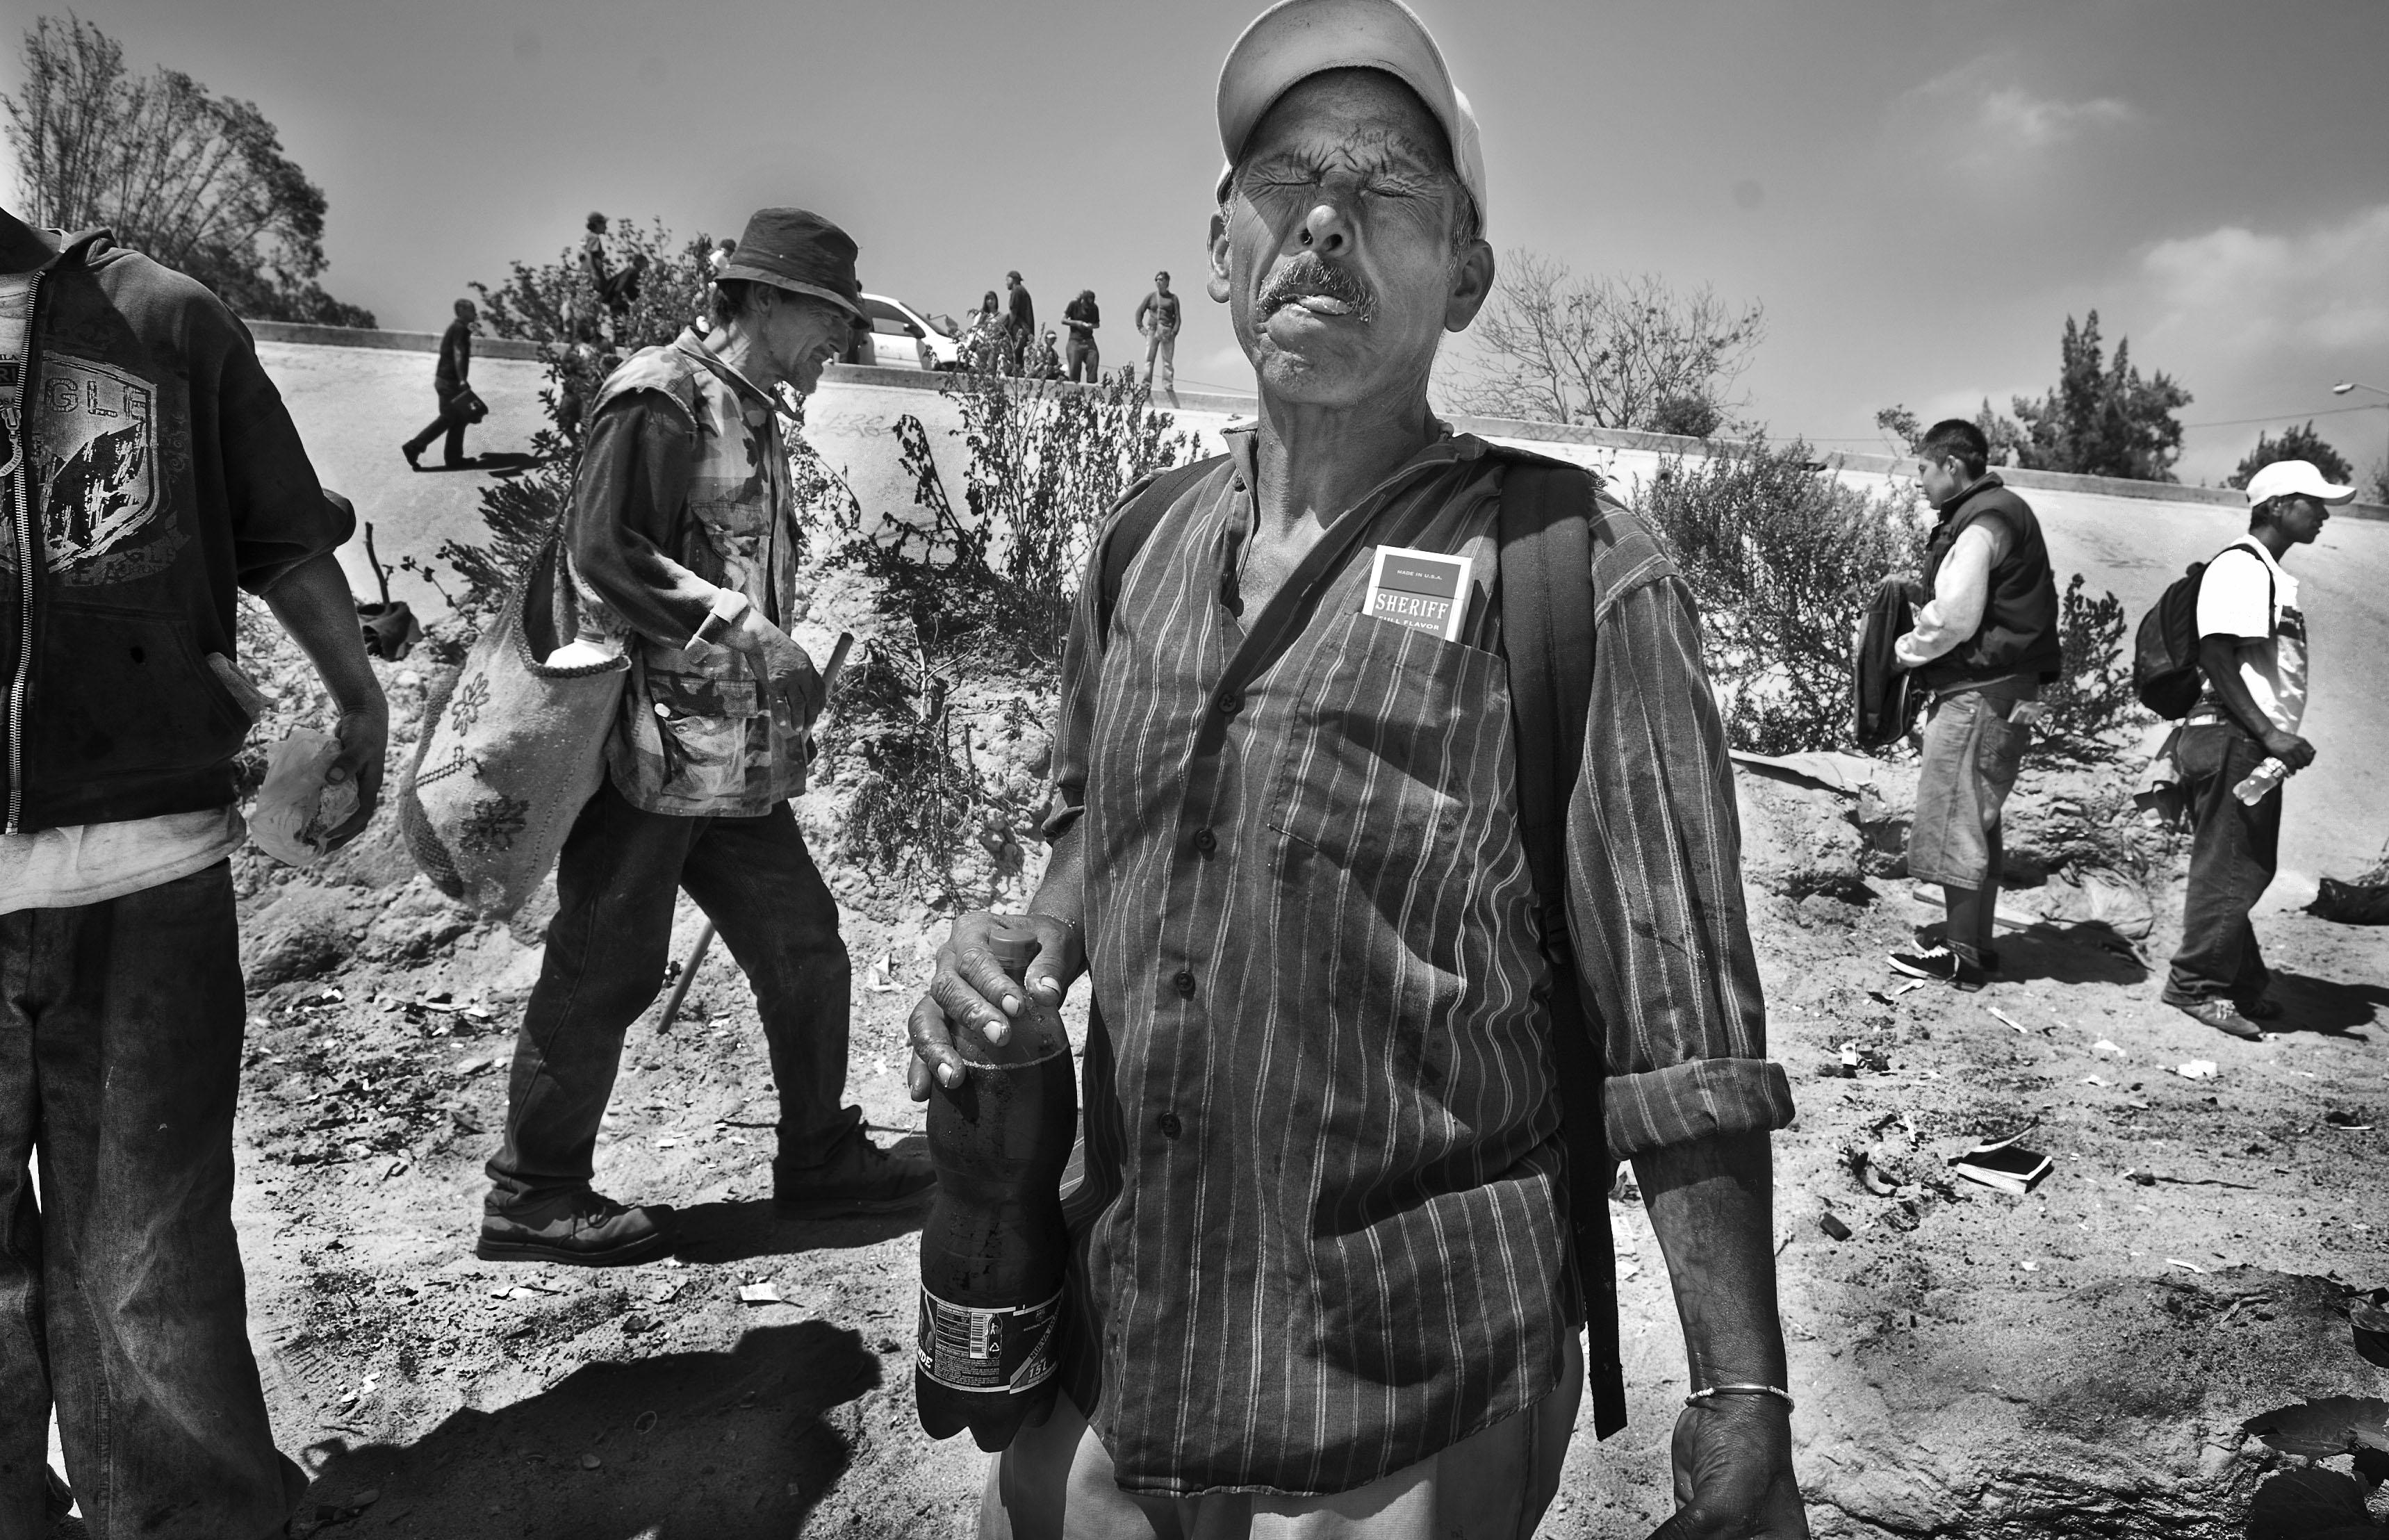 Zona Norte - photographs by Chris Bava